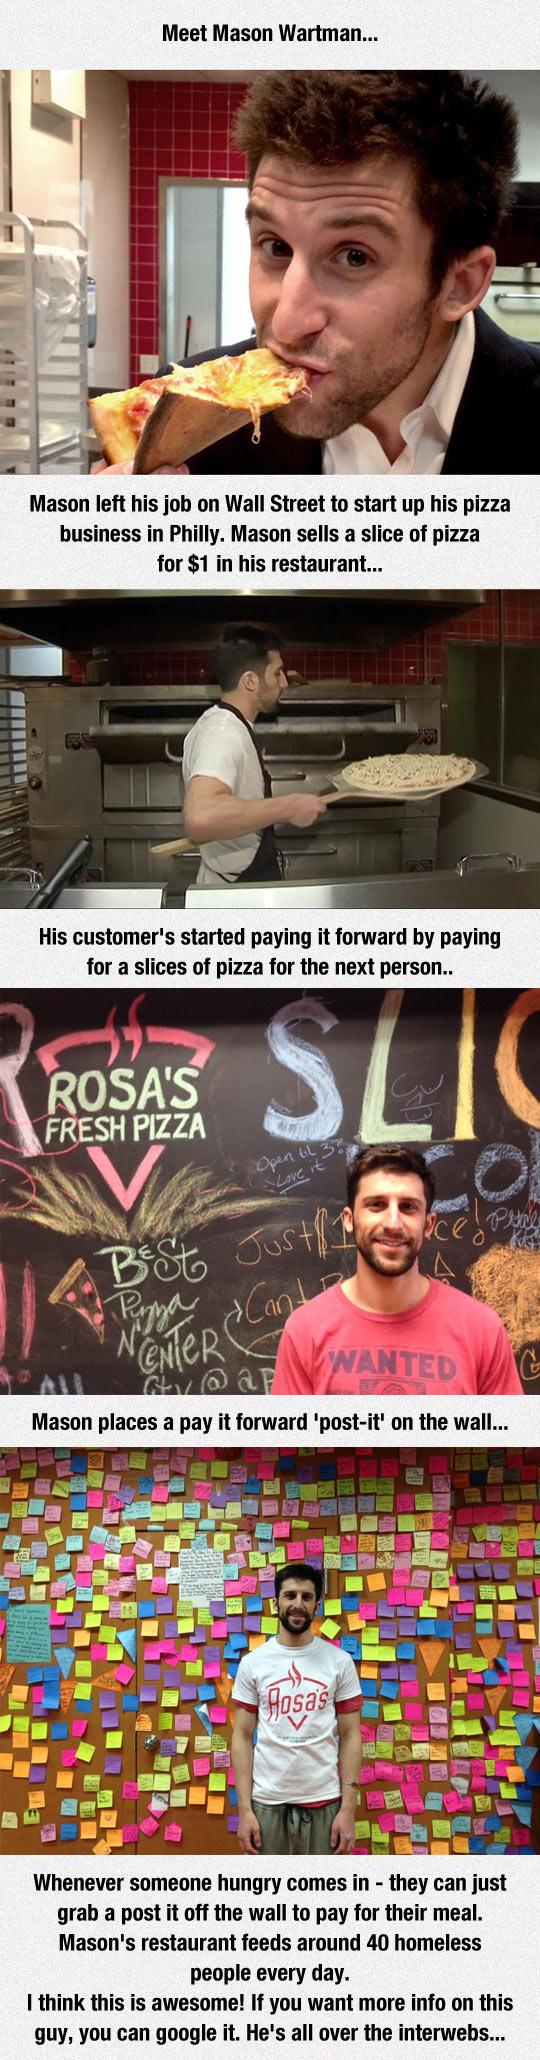 cool-Mason-pizza-business-dollar-homeless-slice